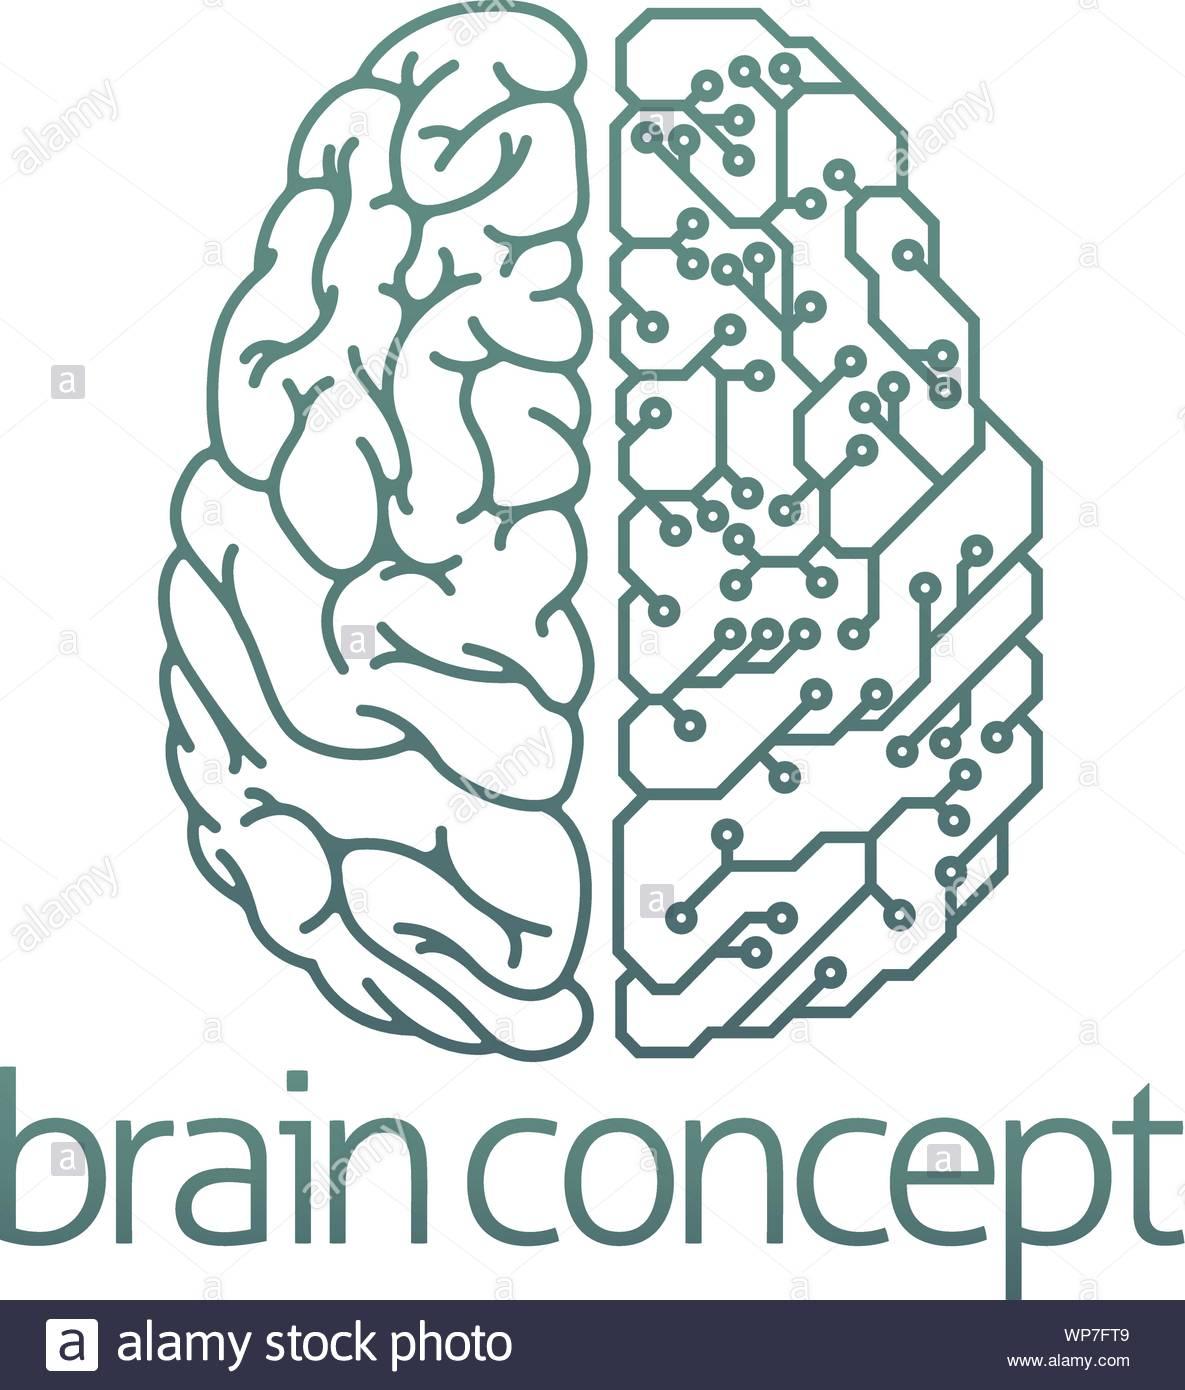 side vector circboard wiring diagram brain half electrical circuit board concept stock vector art  brain half electrical circuit board